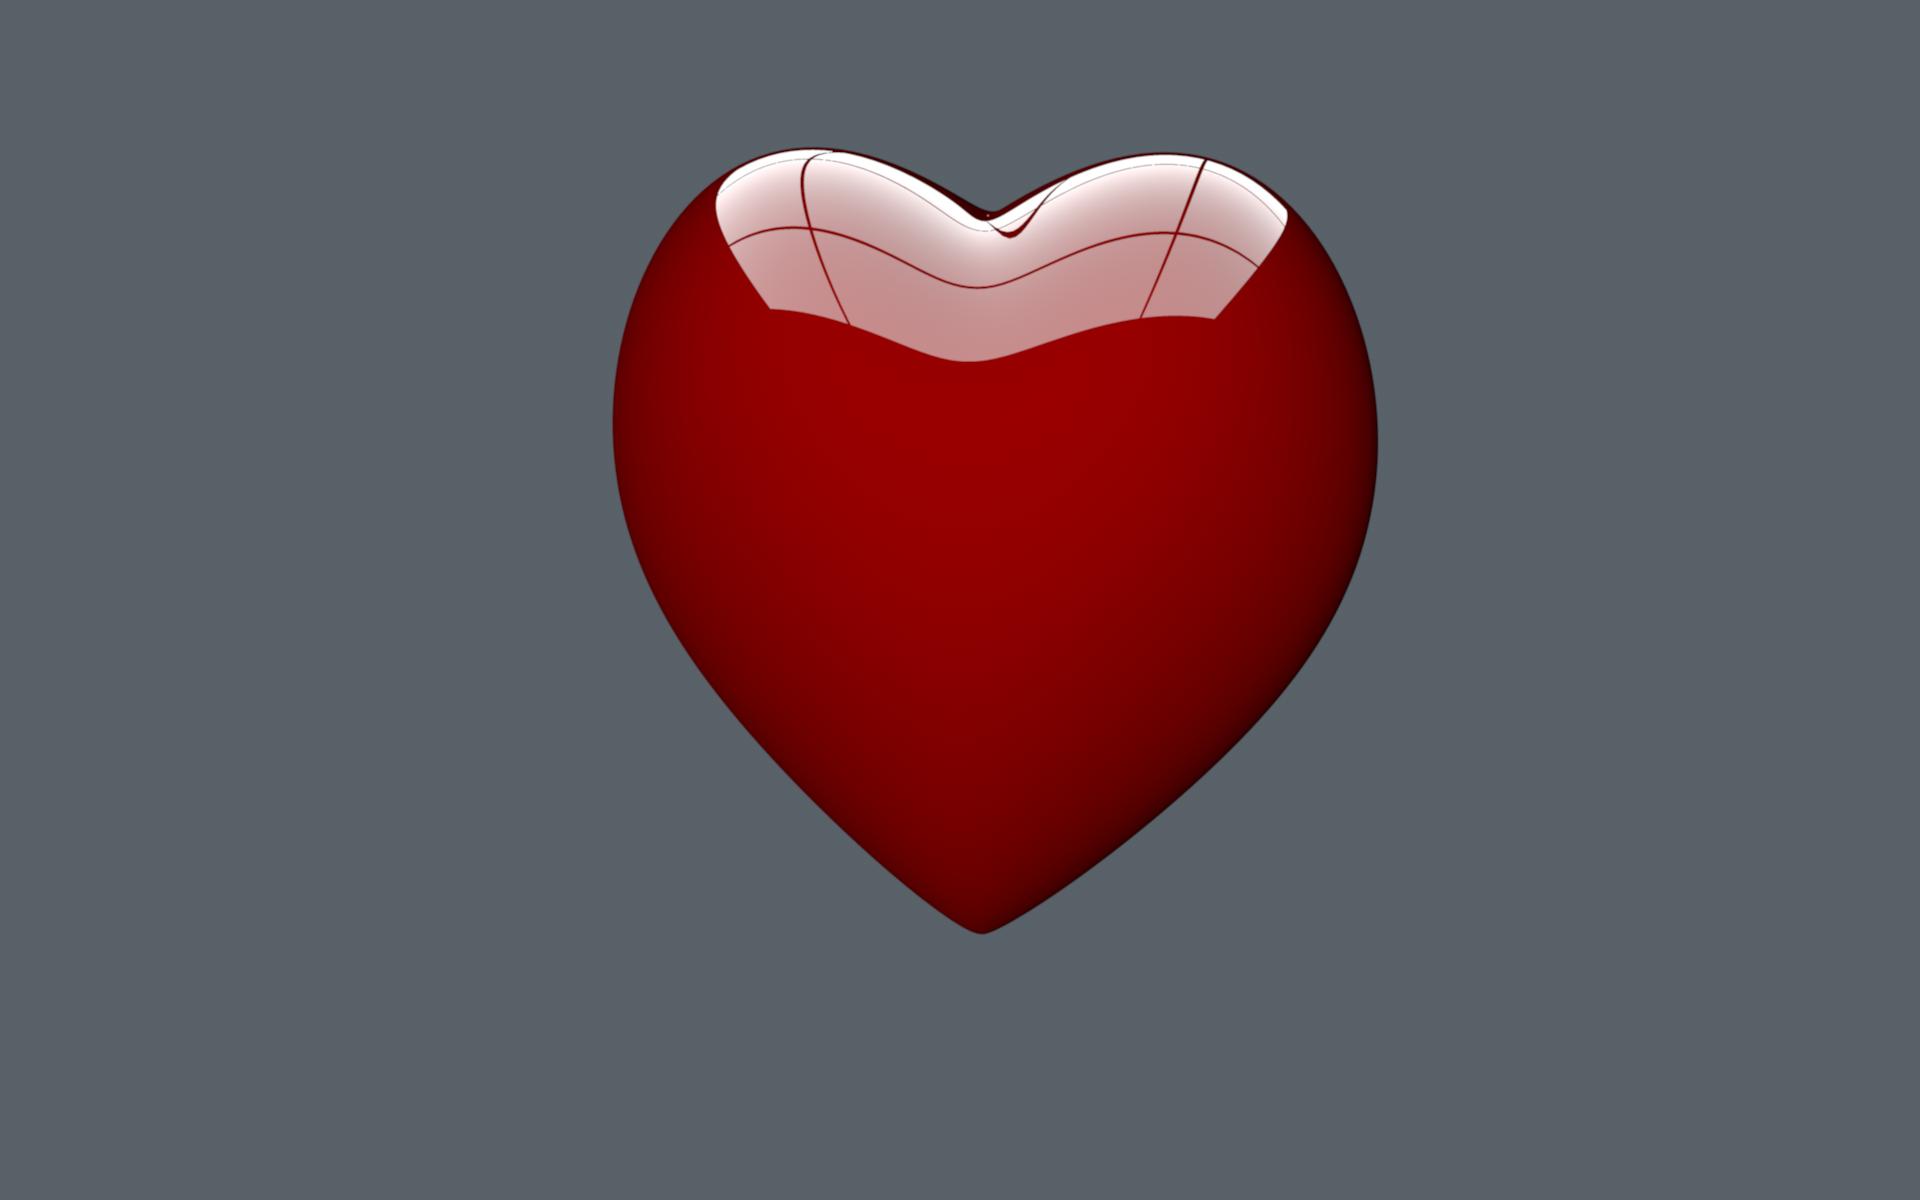 Heart Transparent Background by PlaviDemon on DeviantArt